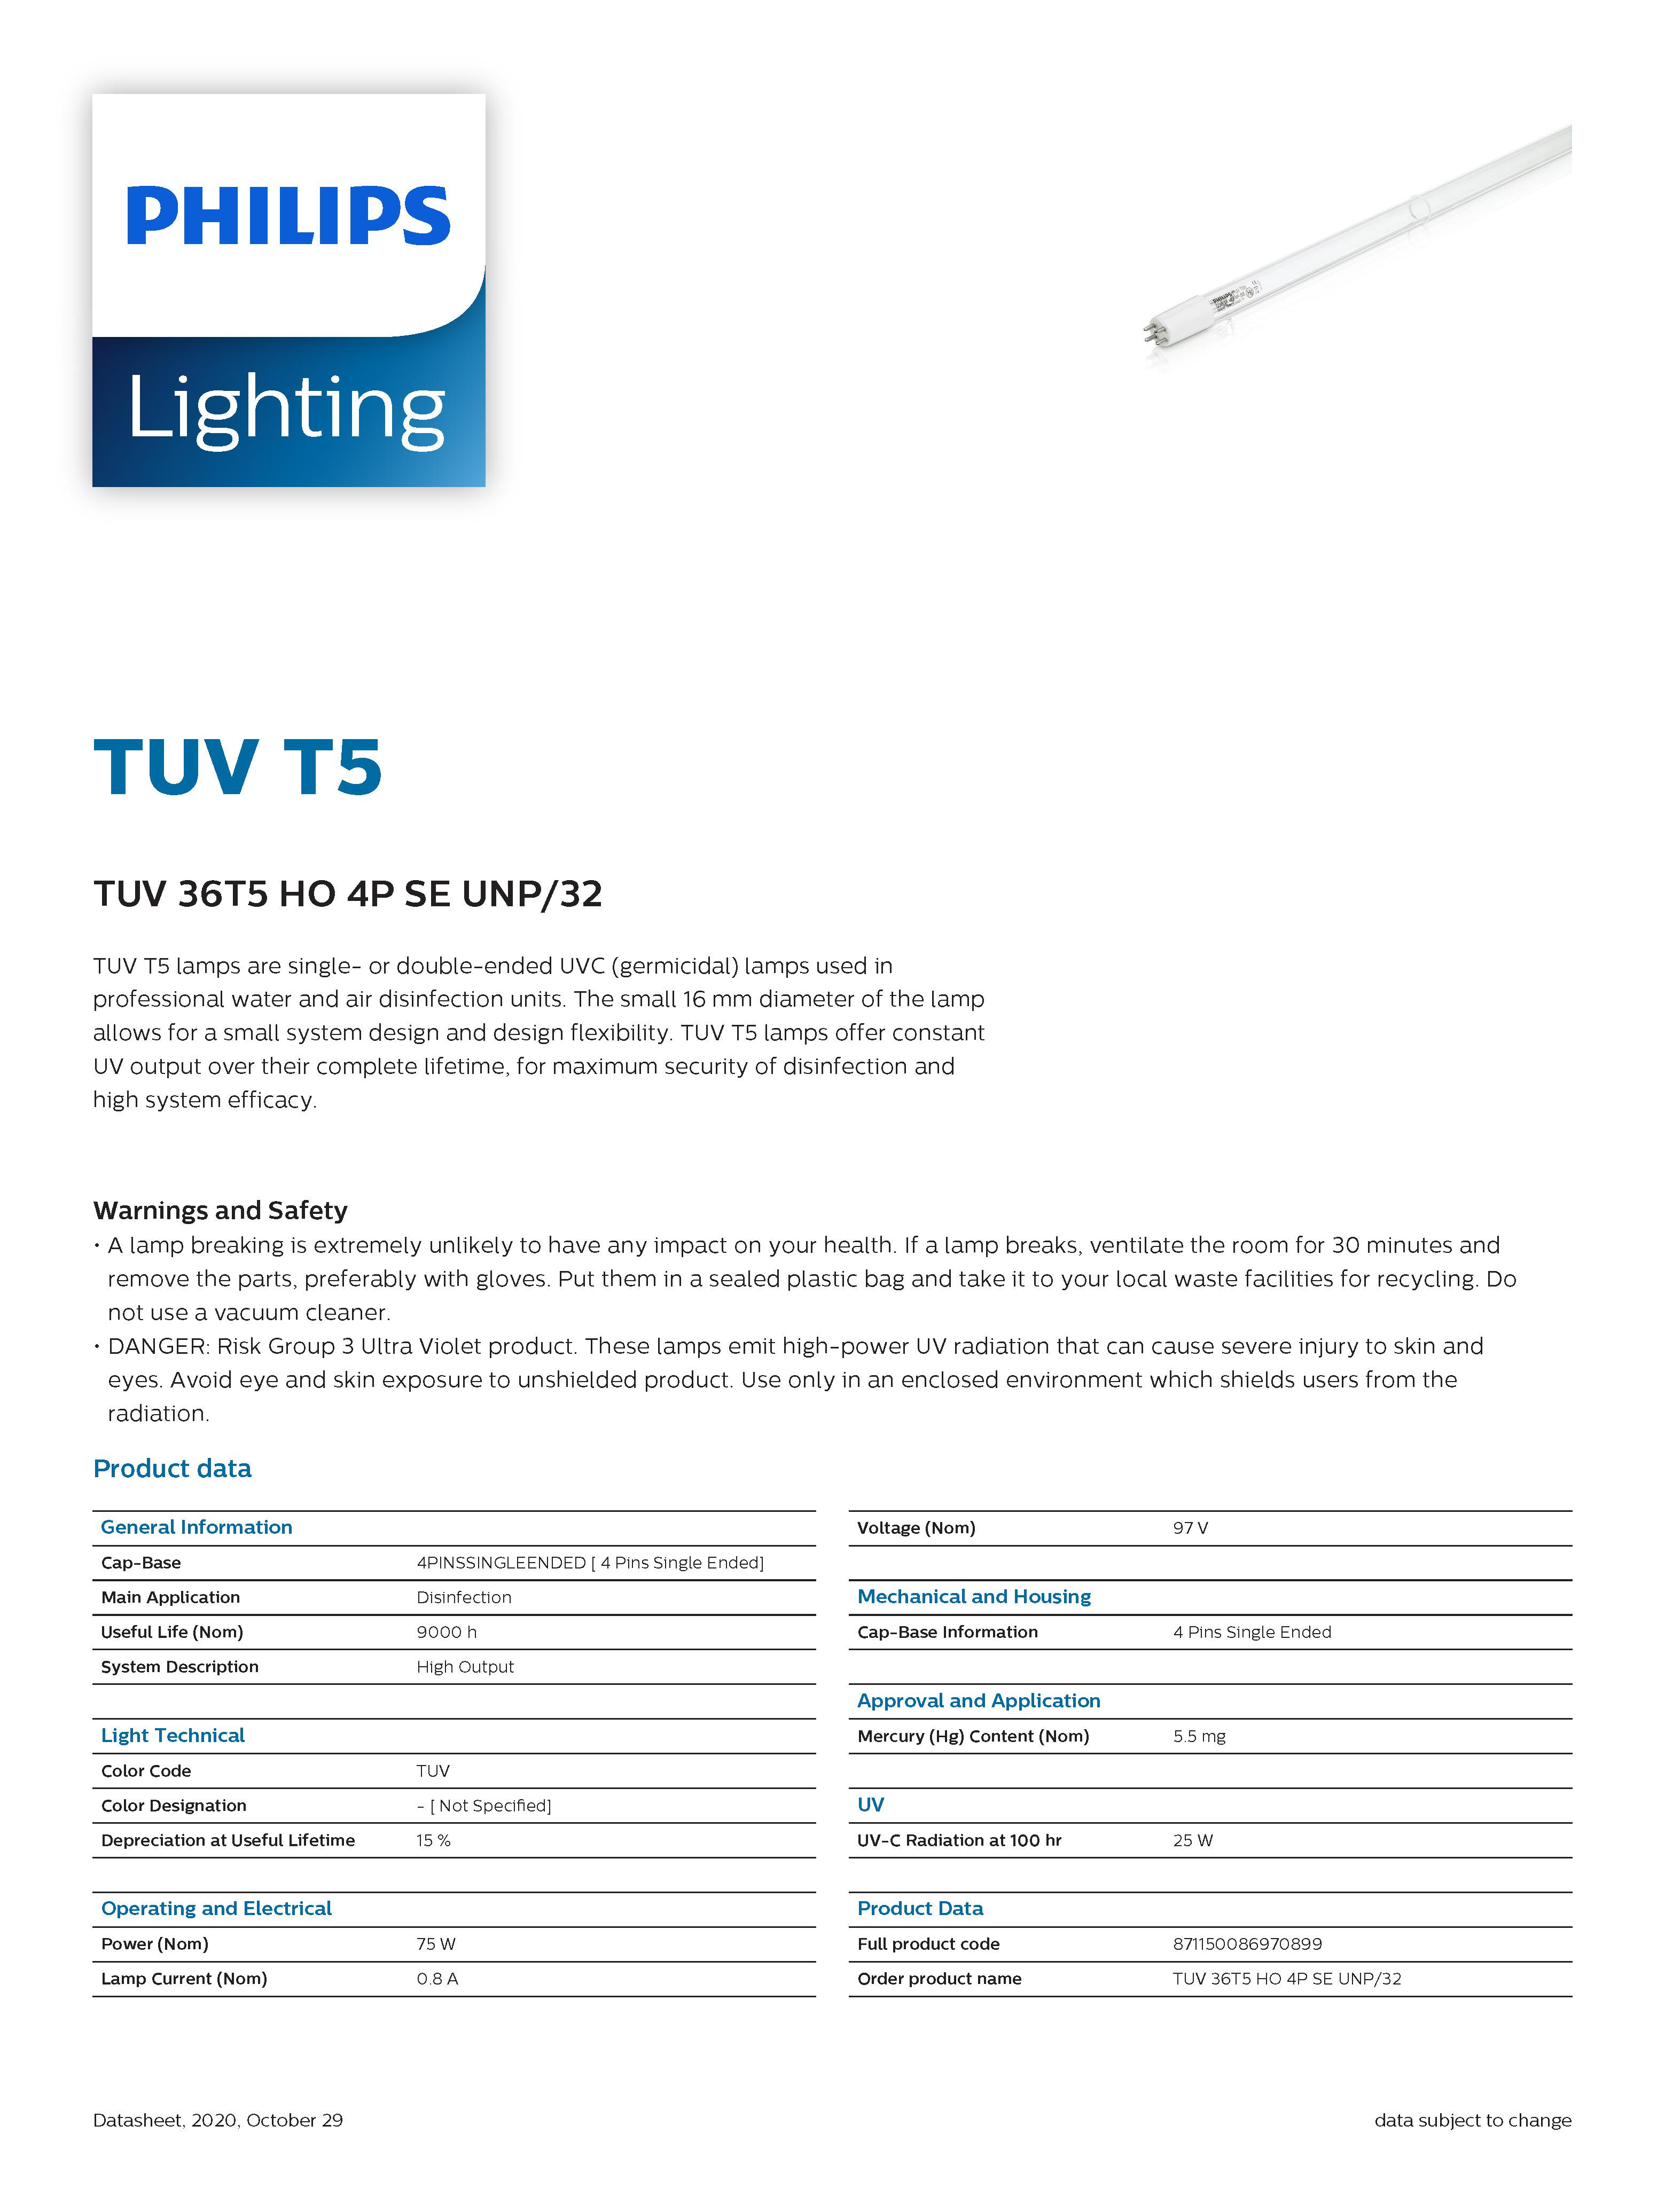 PHILIPS TUV 36 T5 HO 75W 4P-SE